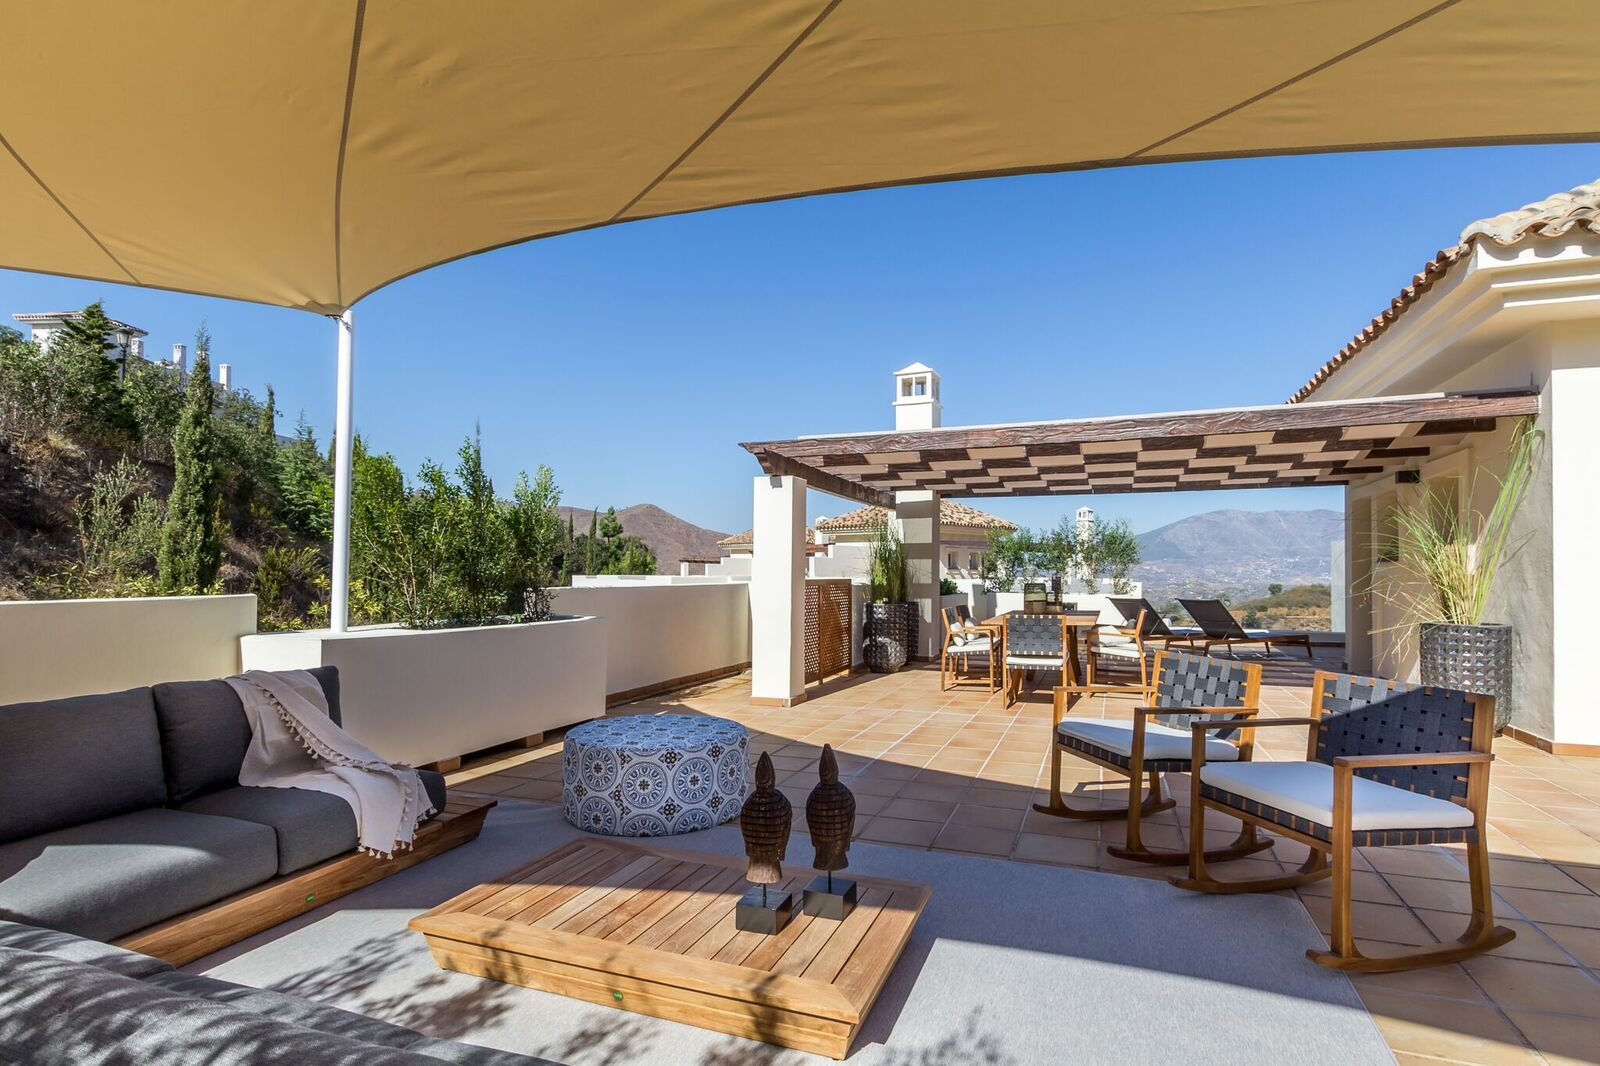 La-Mairena-Terrace-Exterior-3